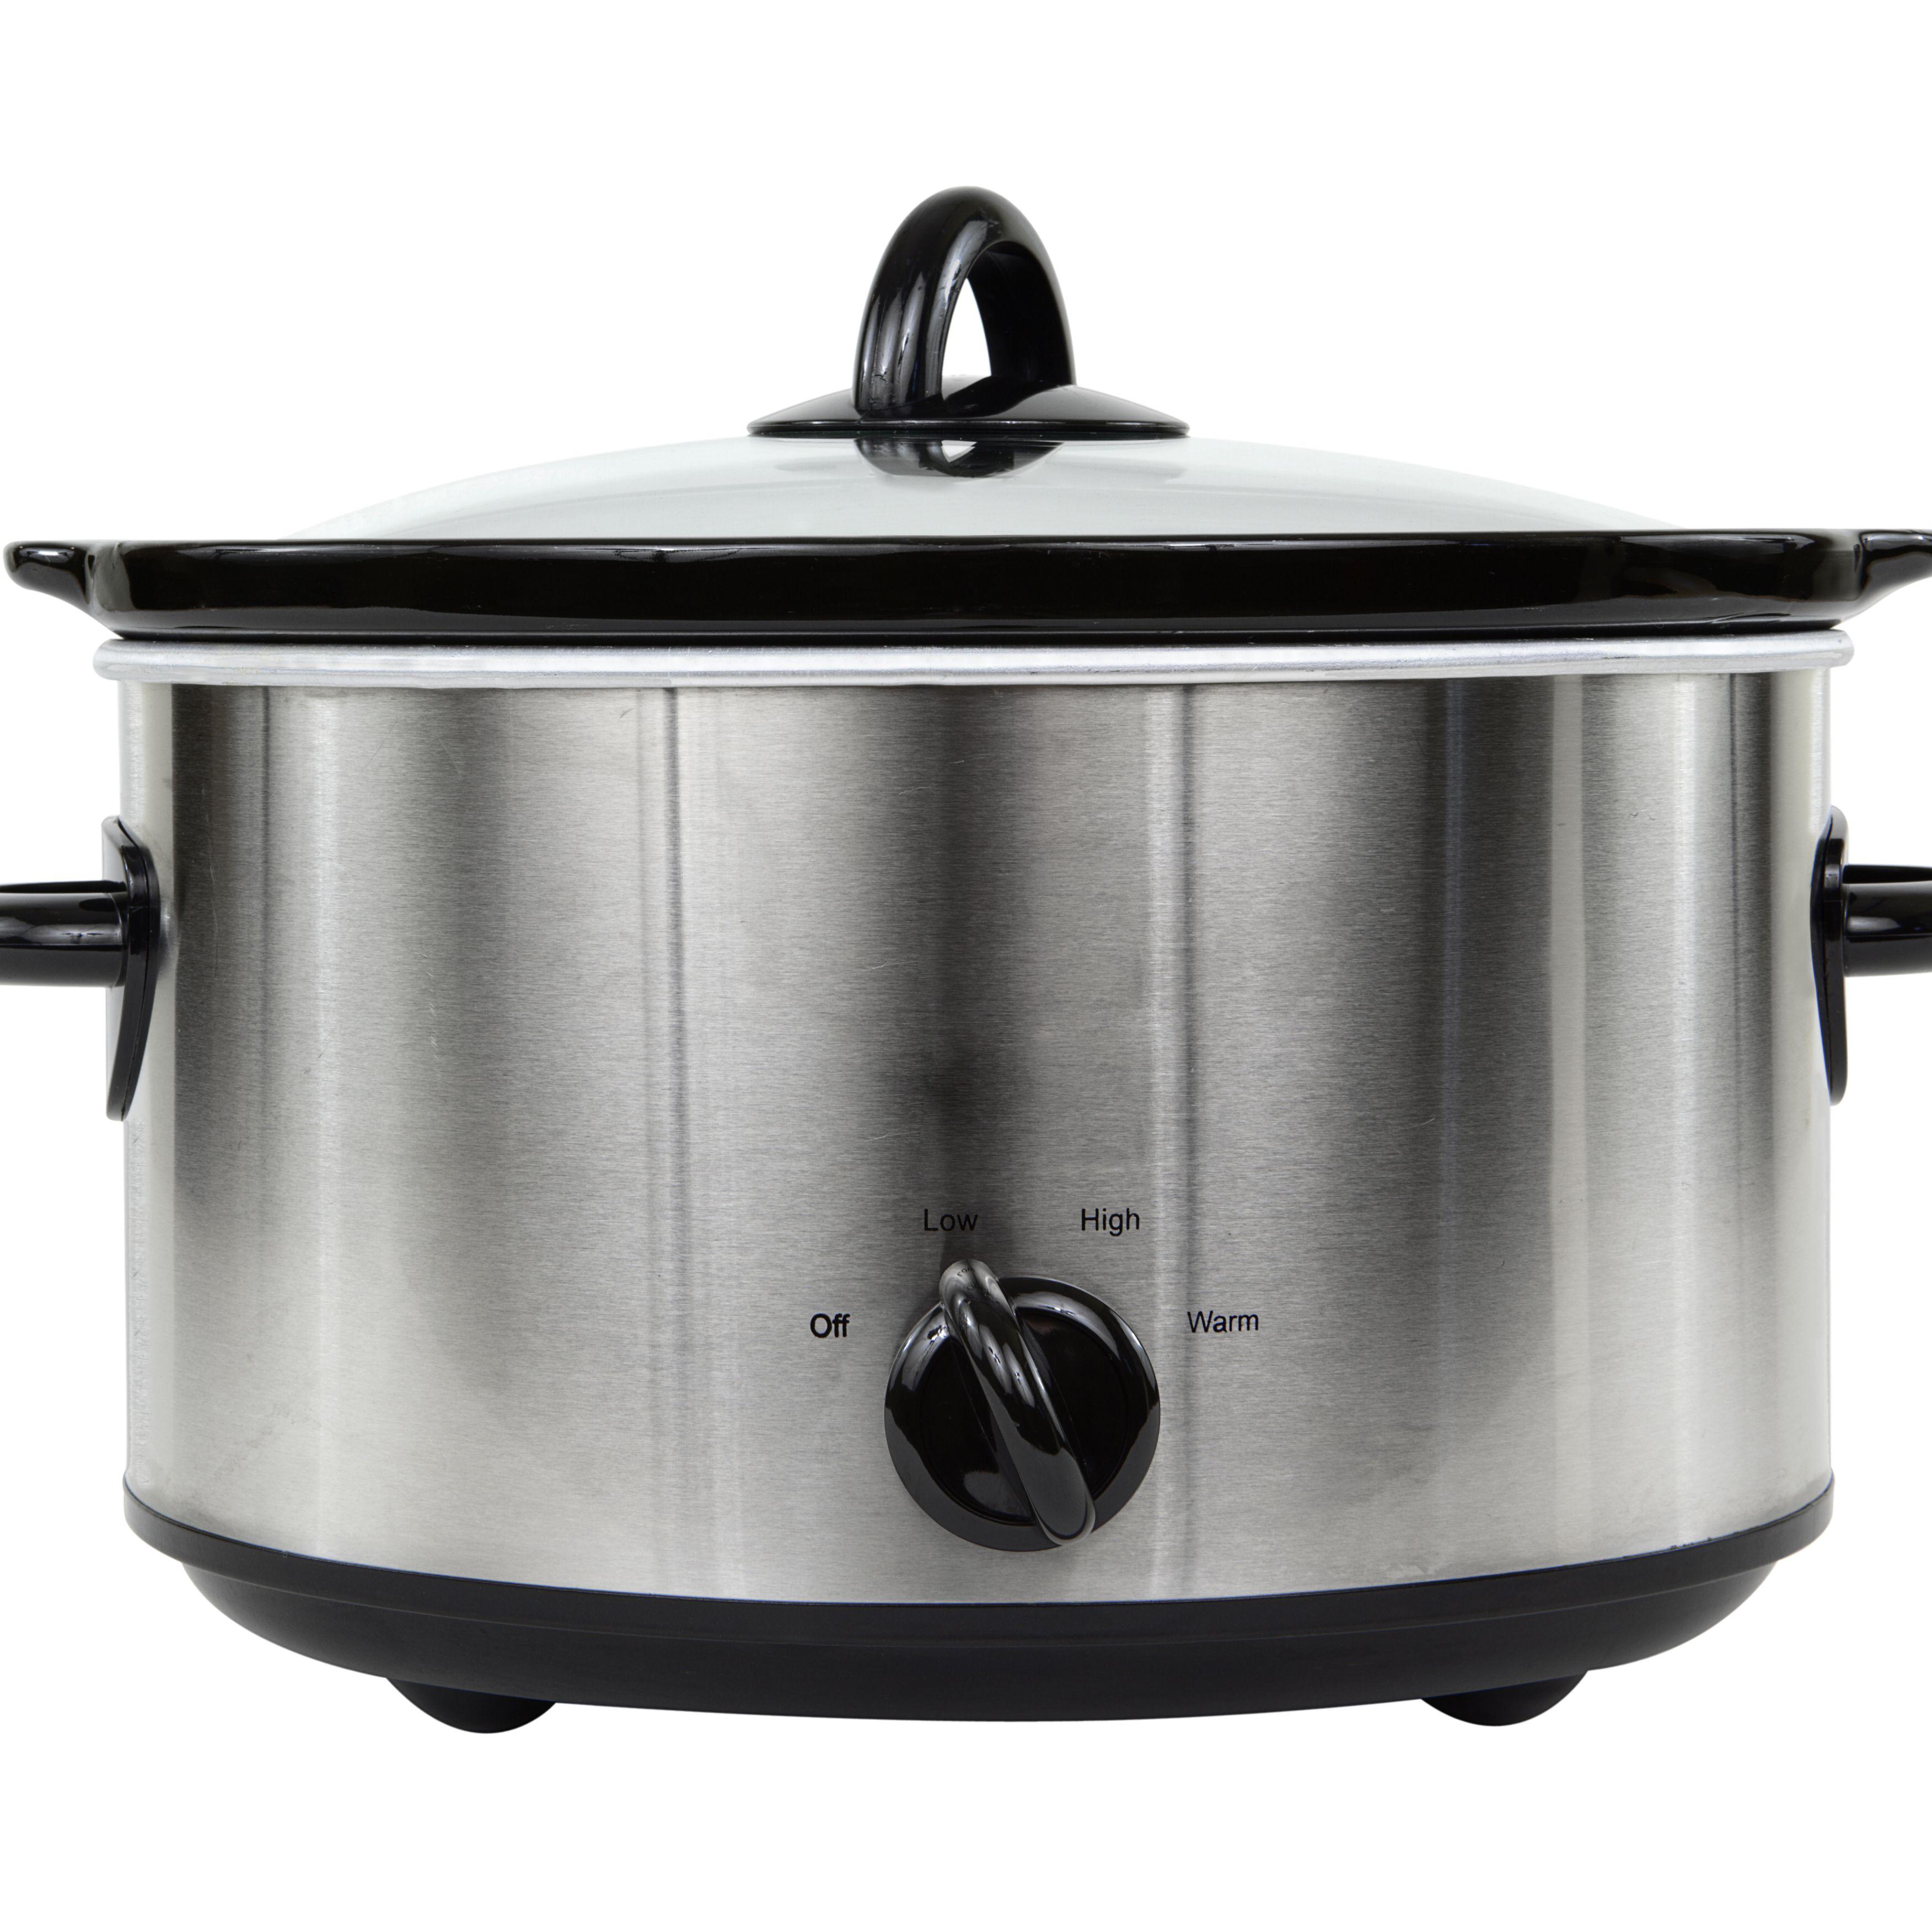 Crock-Pot Slow Cooker Large Oval 6 Quart Stainless Steel Manual Crockpot New